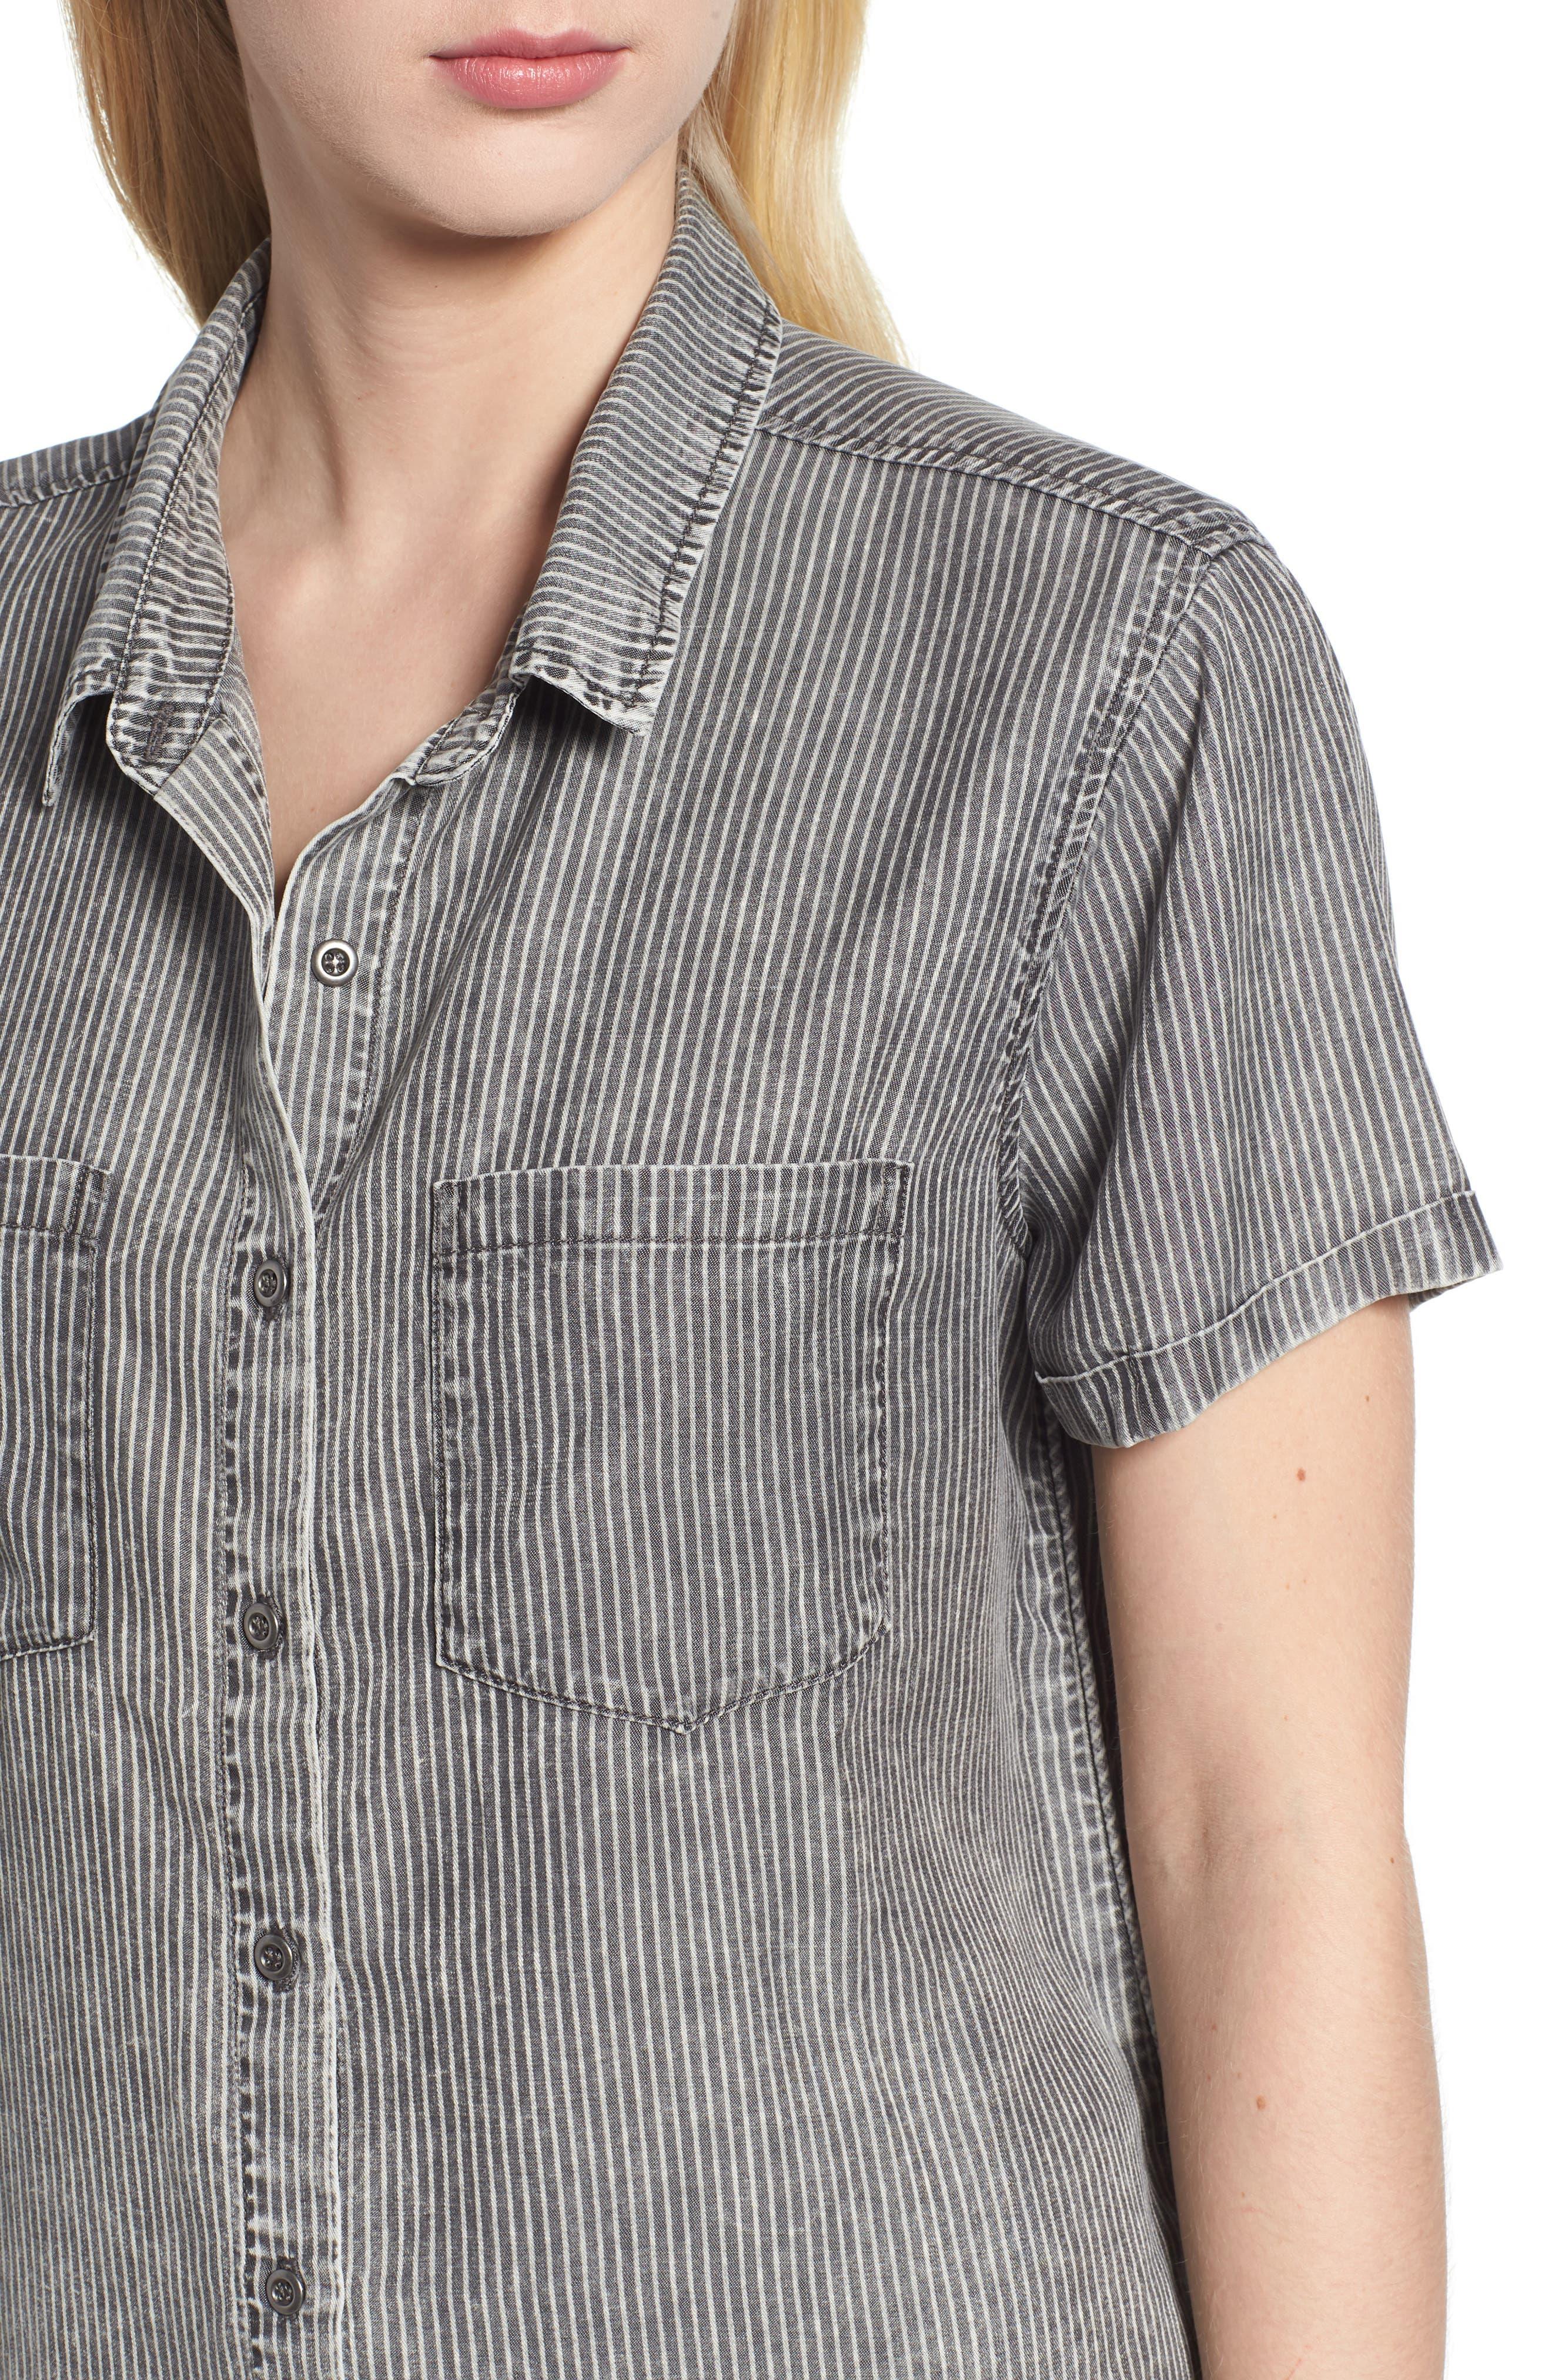 Ticking Stripe Shirt,                             Alternate thumbnail 4, color,                             Grey Rr